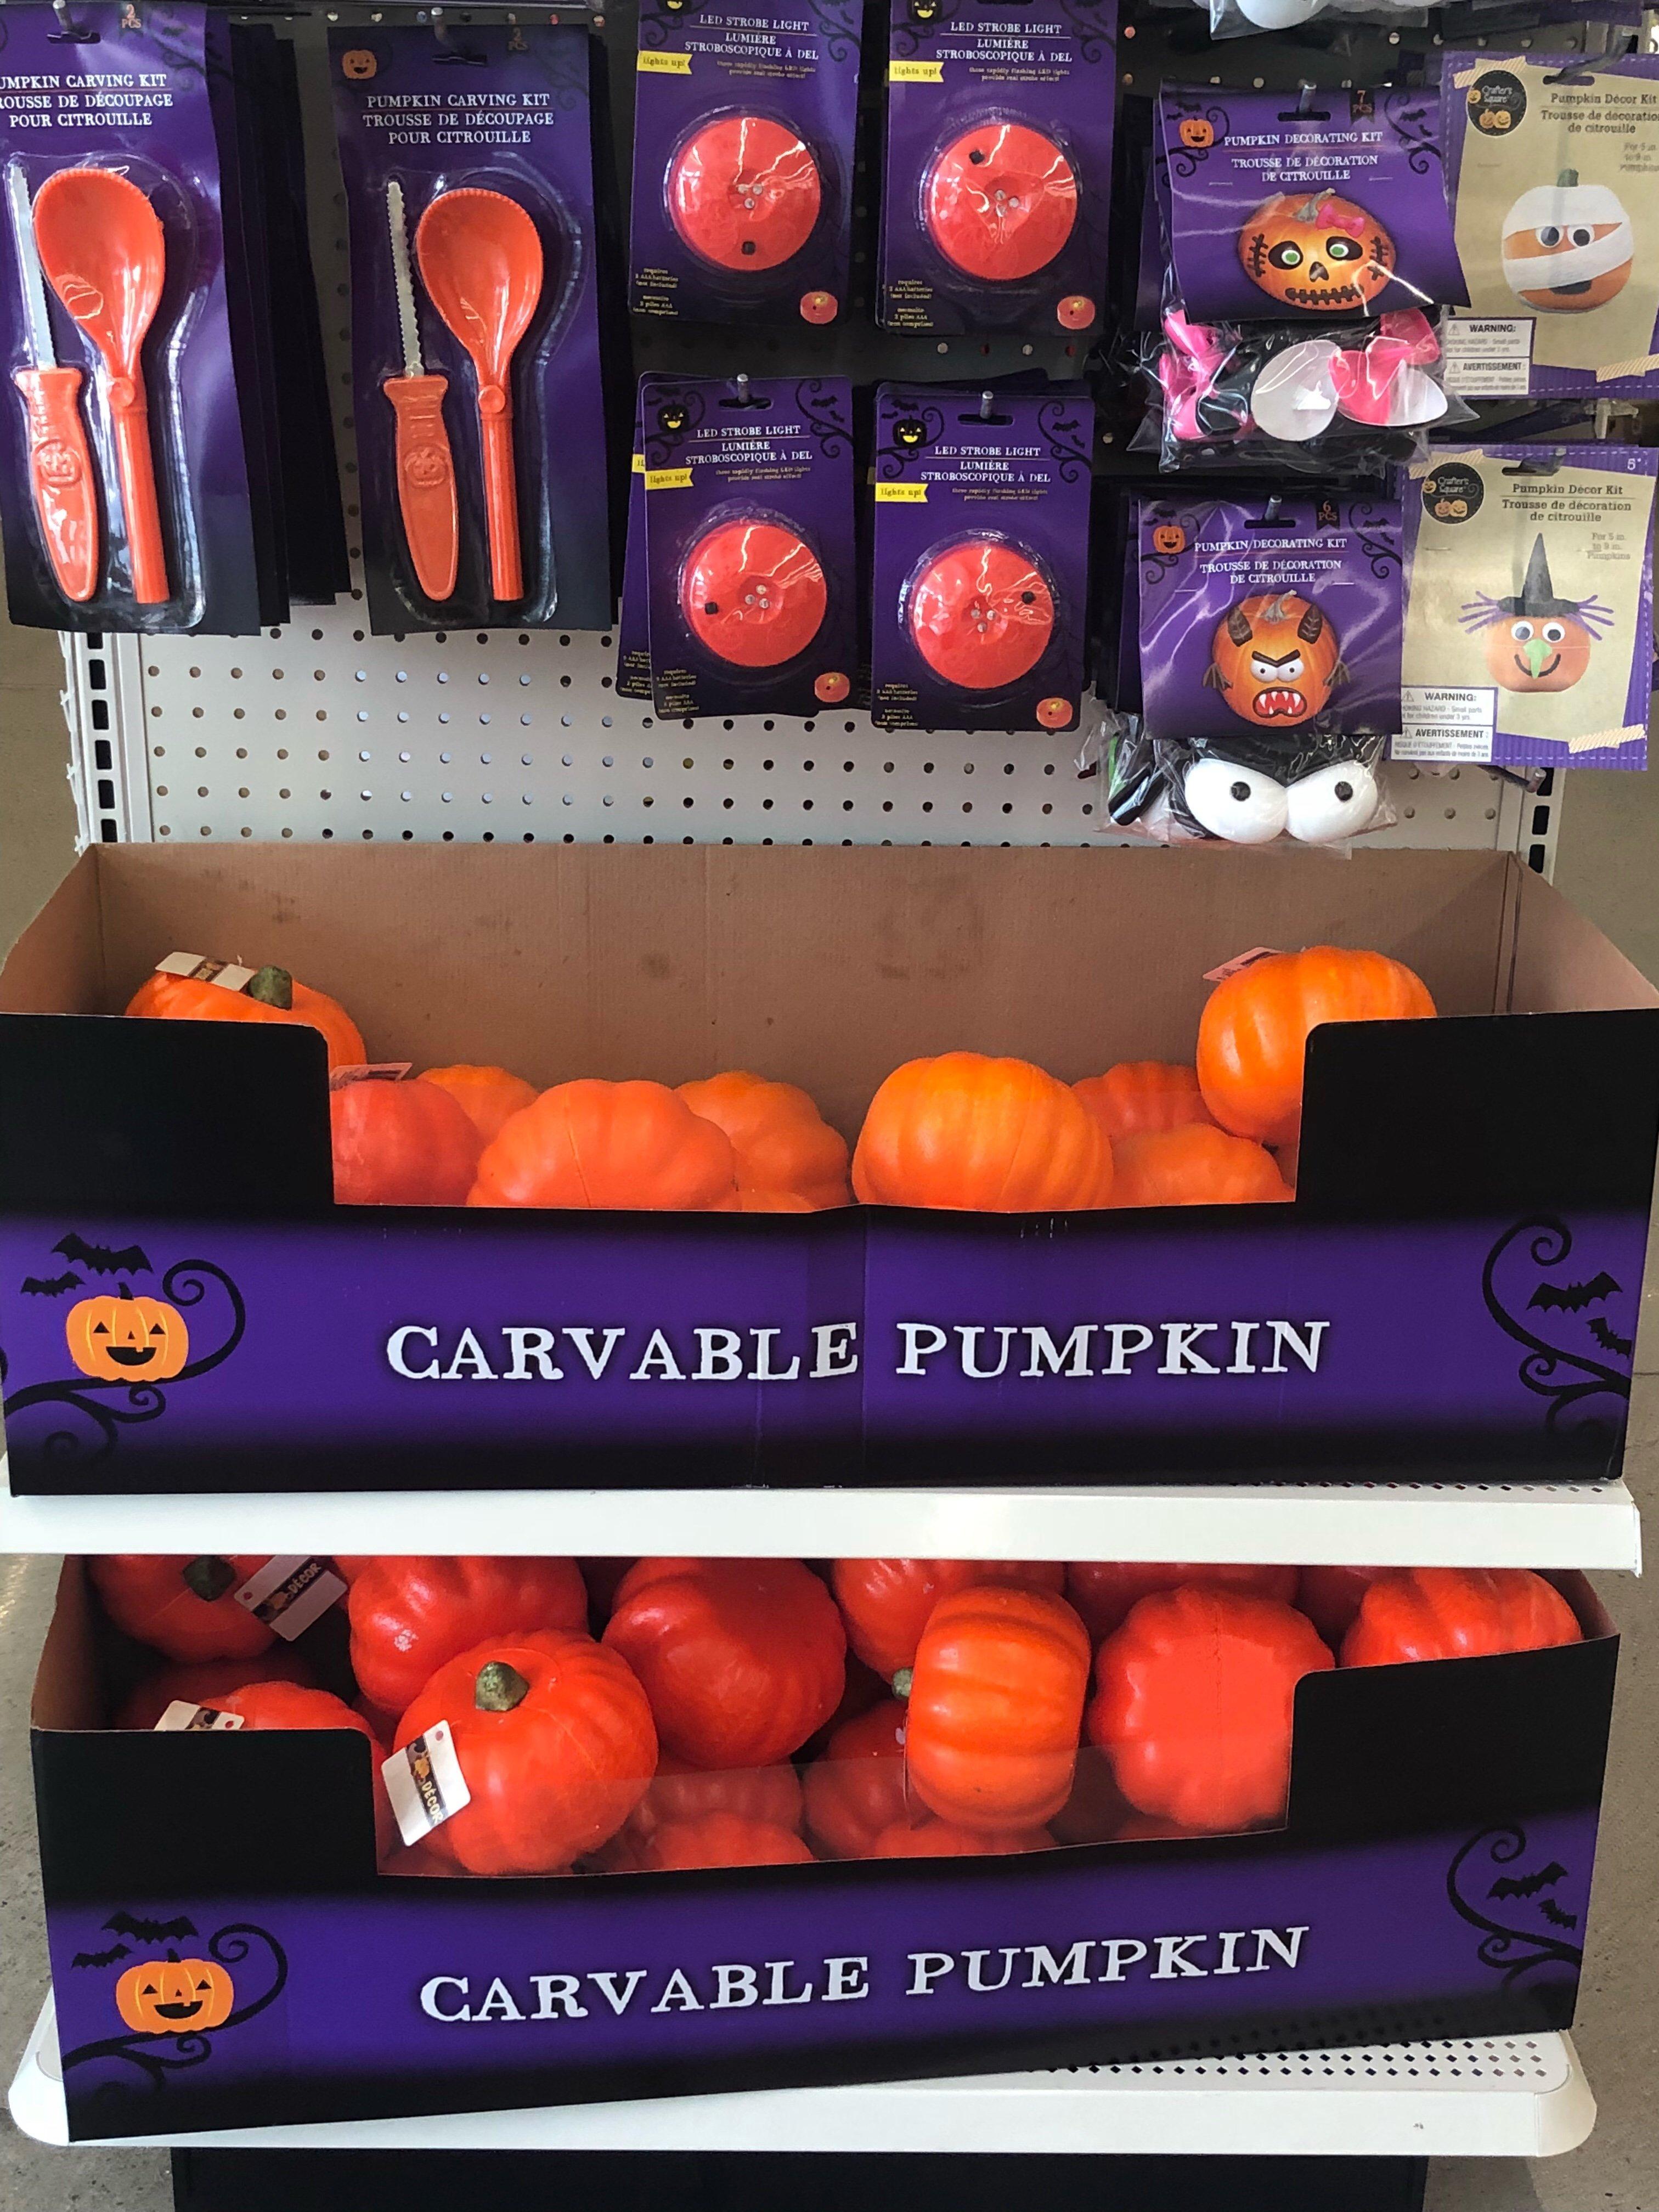 Easy no sew fabric pumpkins from dollar tree pumpkins